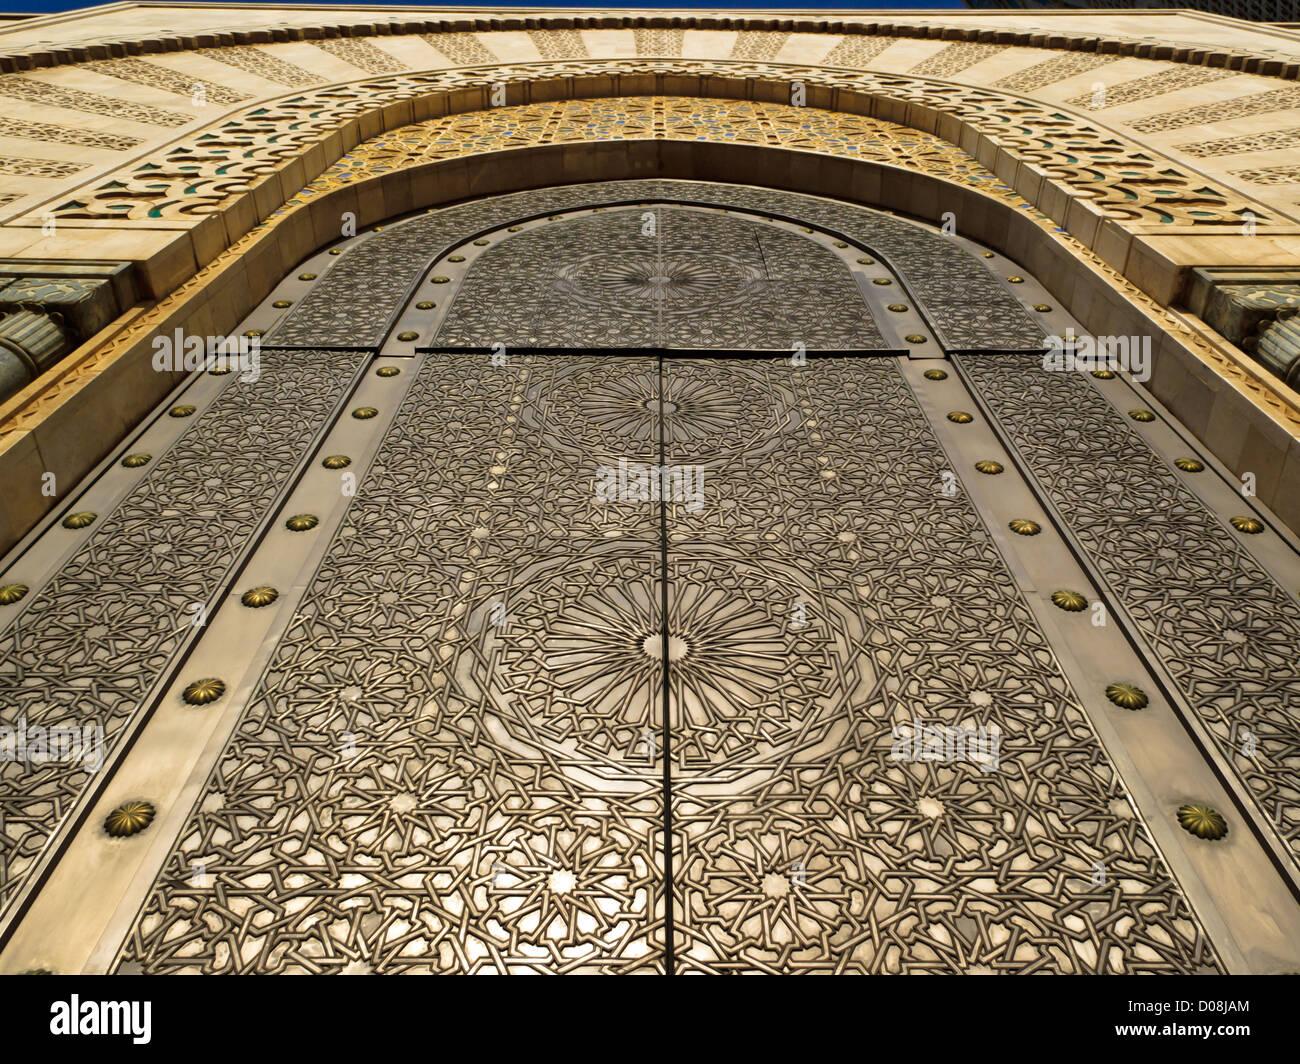 What Is A Mosque Detail: Tile Mosque Geometric Art Stock Photos & Tile Mosque